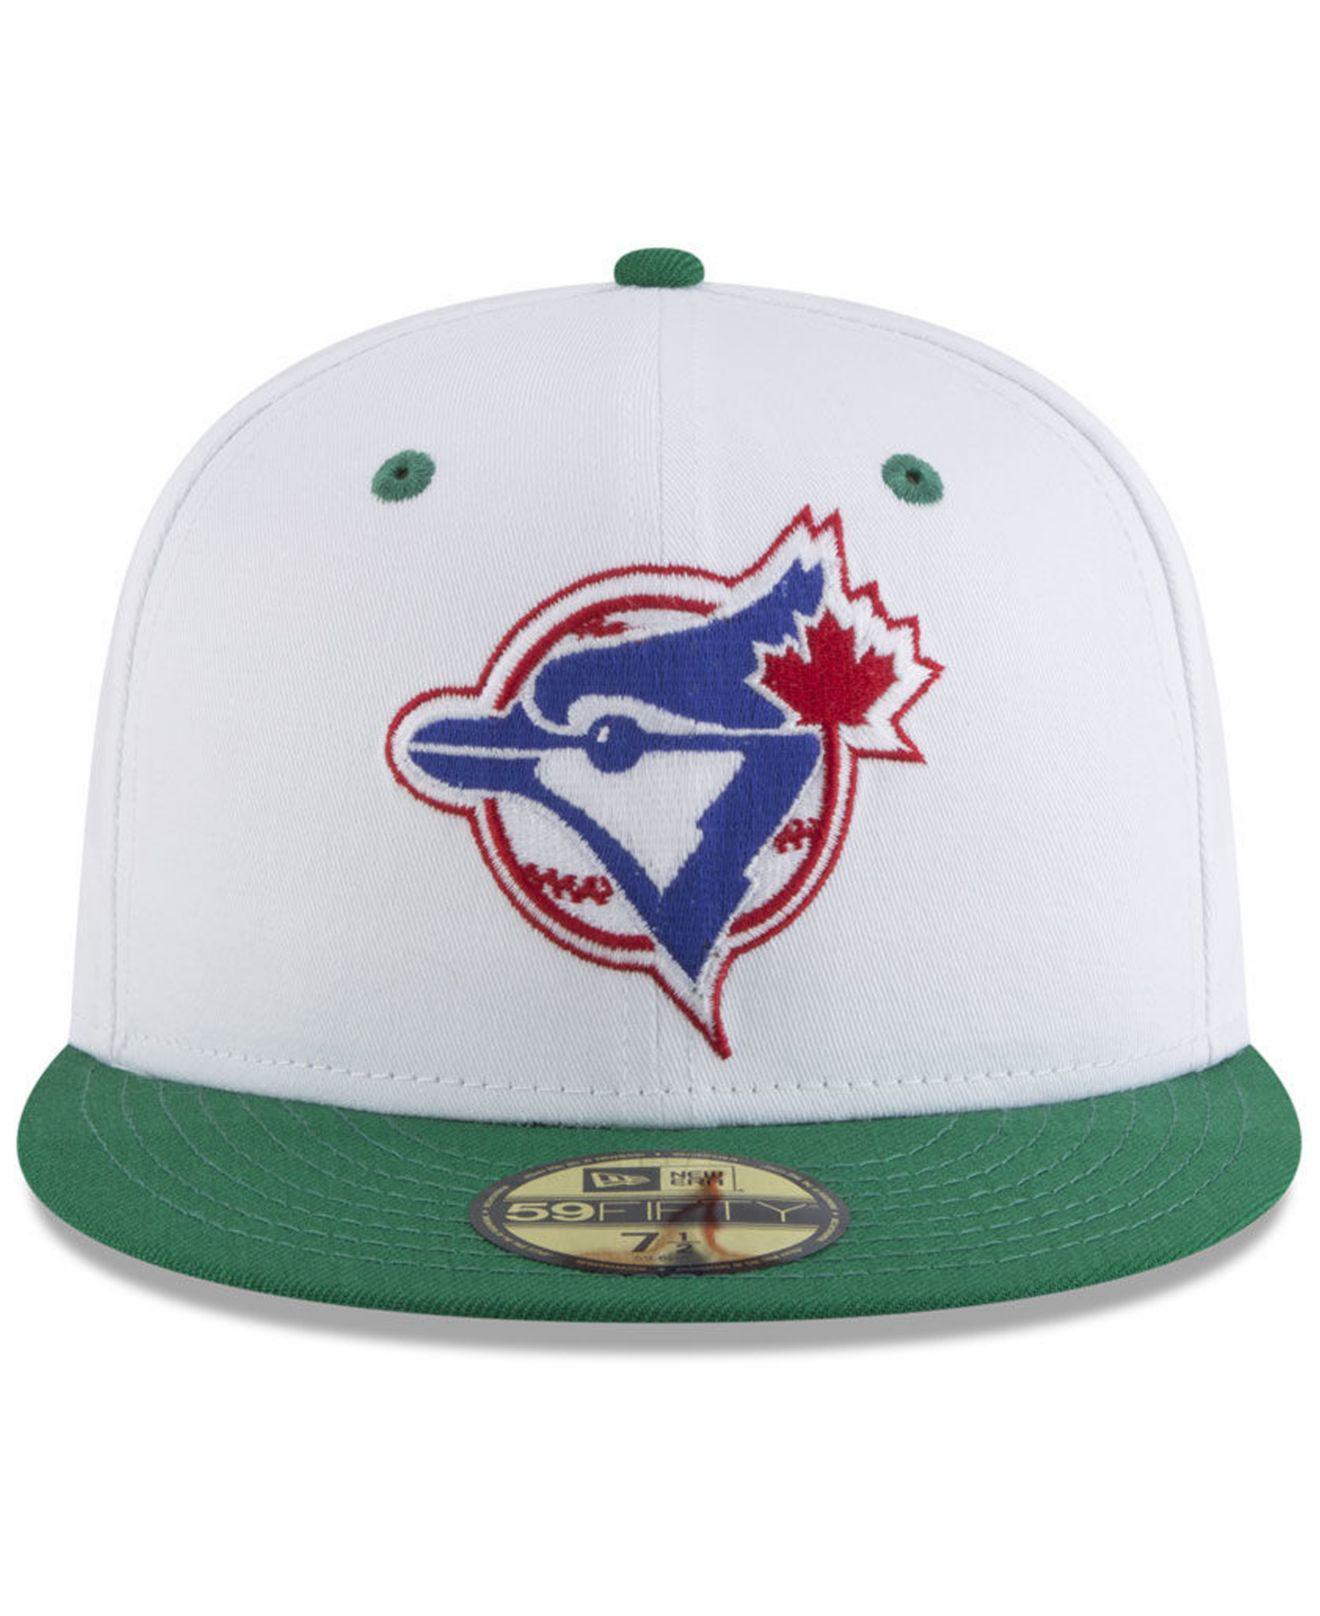 e9129e2fc2c Lyst - Ktz Toronto Blue Jays Retro Diamond 59fifty Fitted Cap for Men